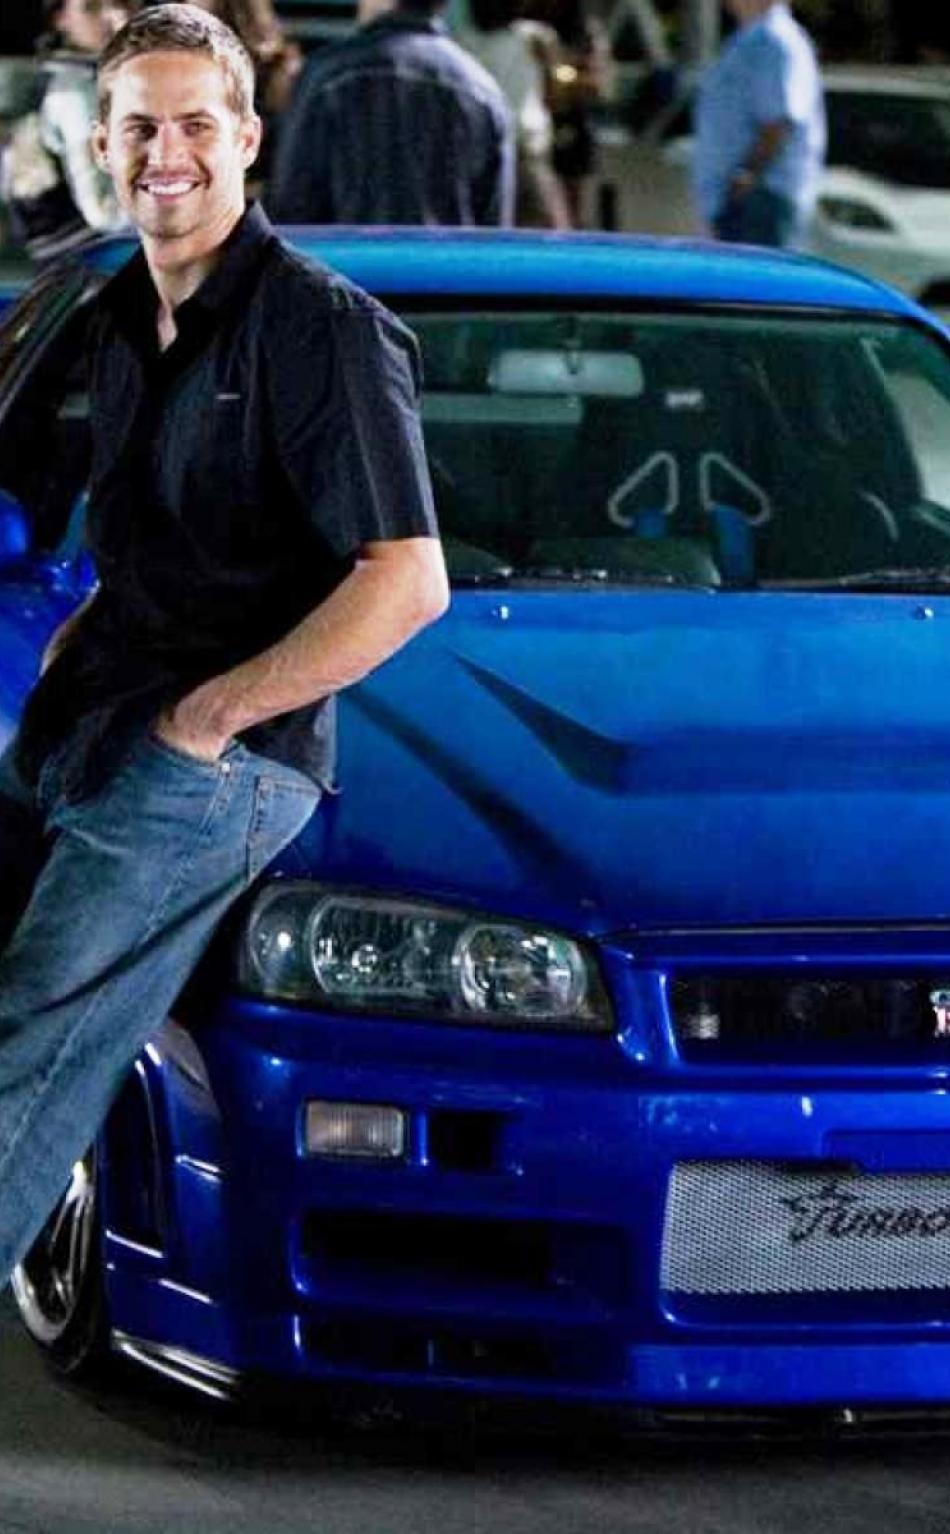 fast and furious paul walker blue car photoshoot full hd